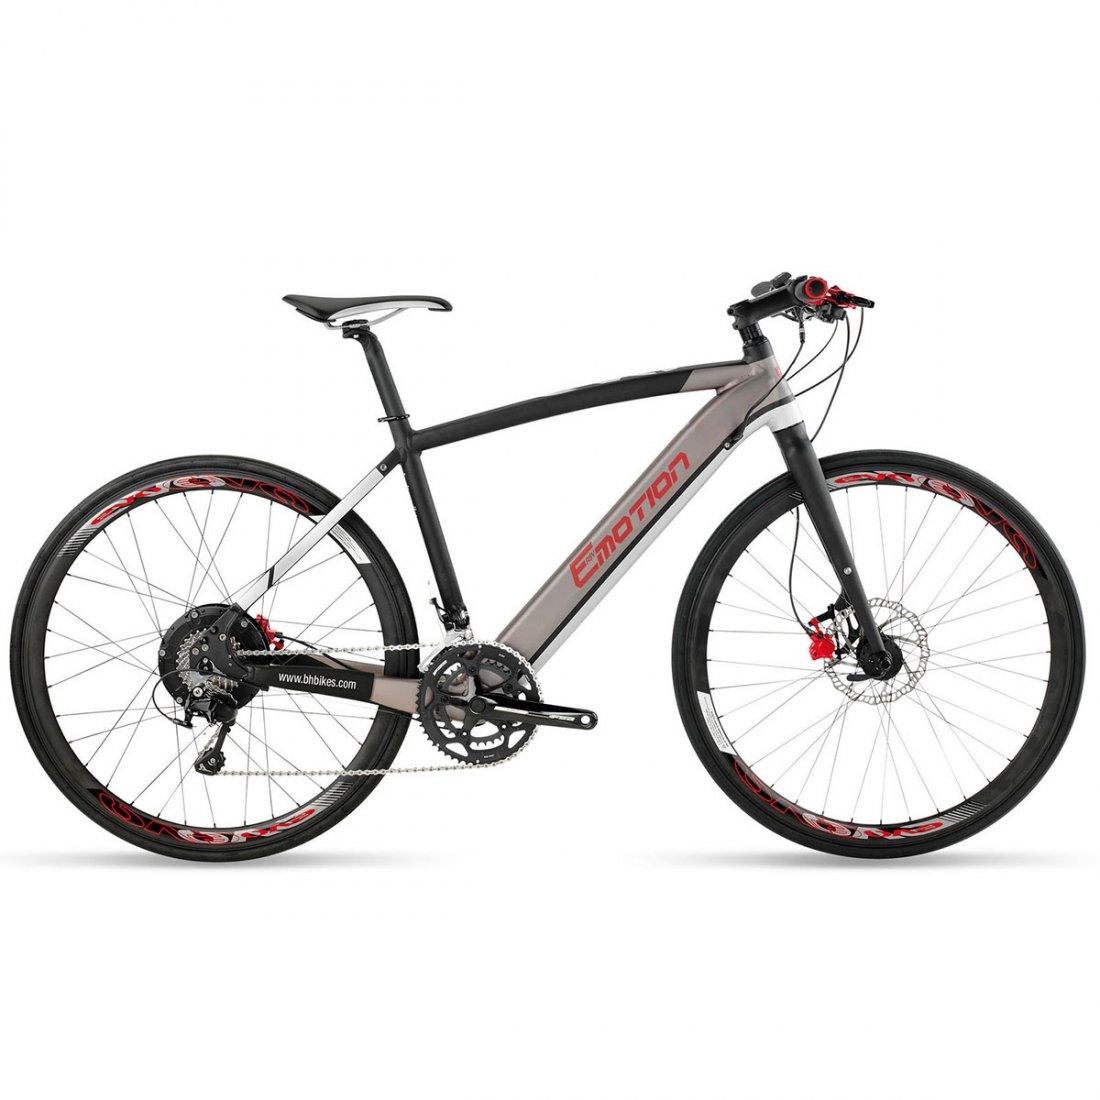 Bh Evo Race Pro Grey Black Red Road Bike Motocard